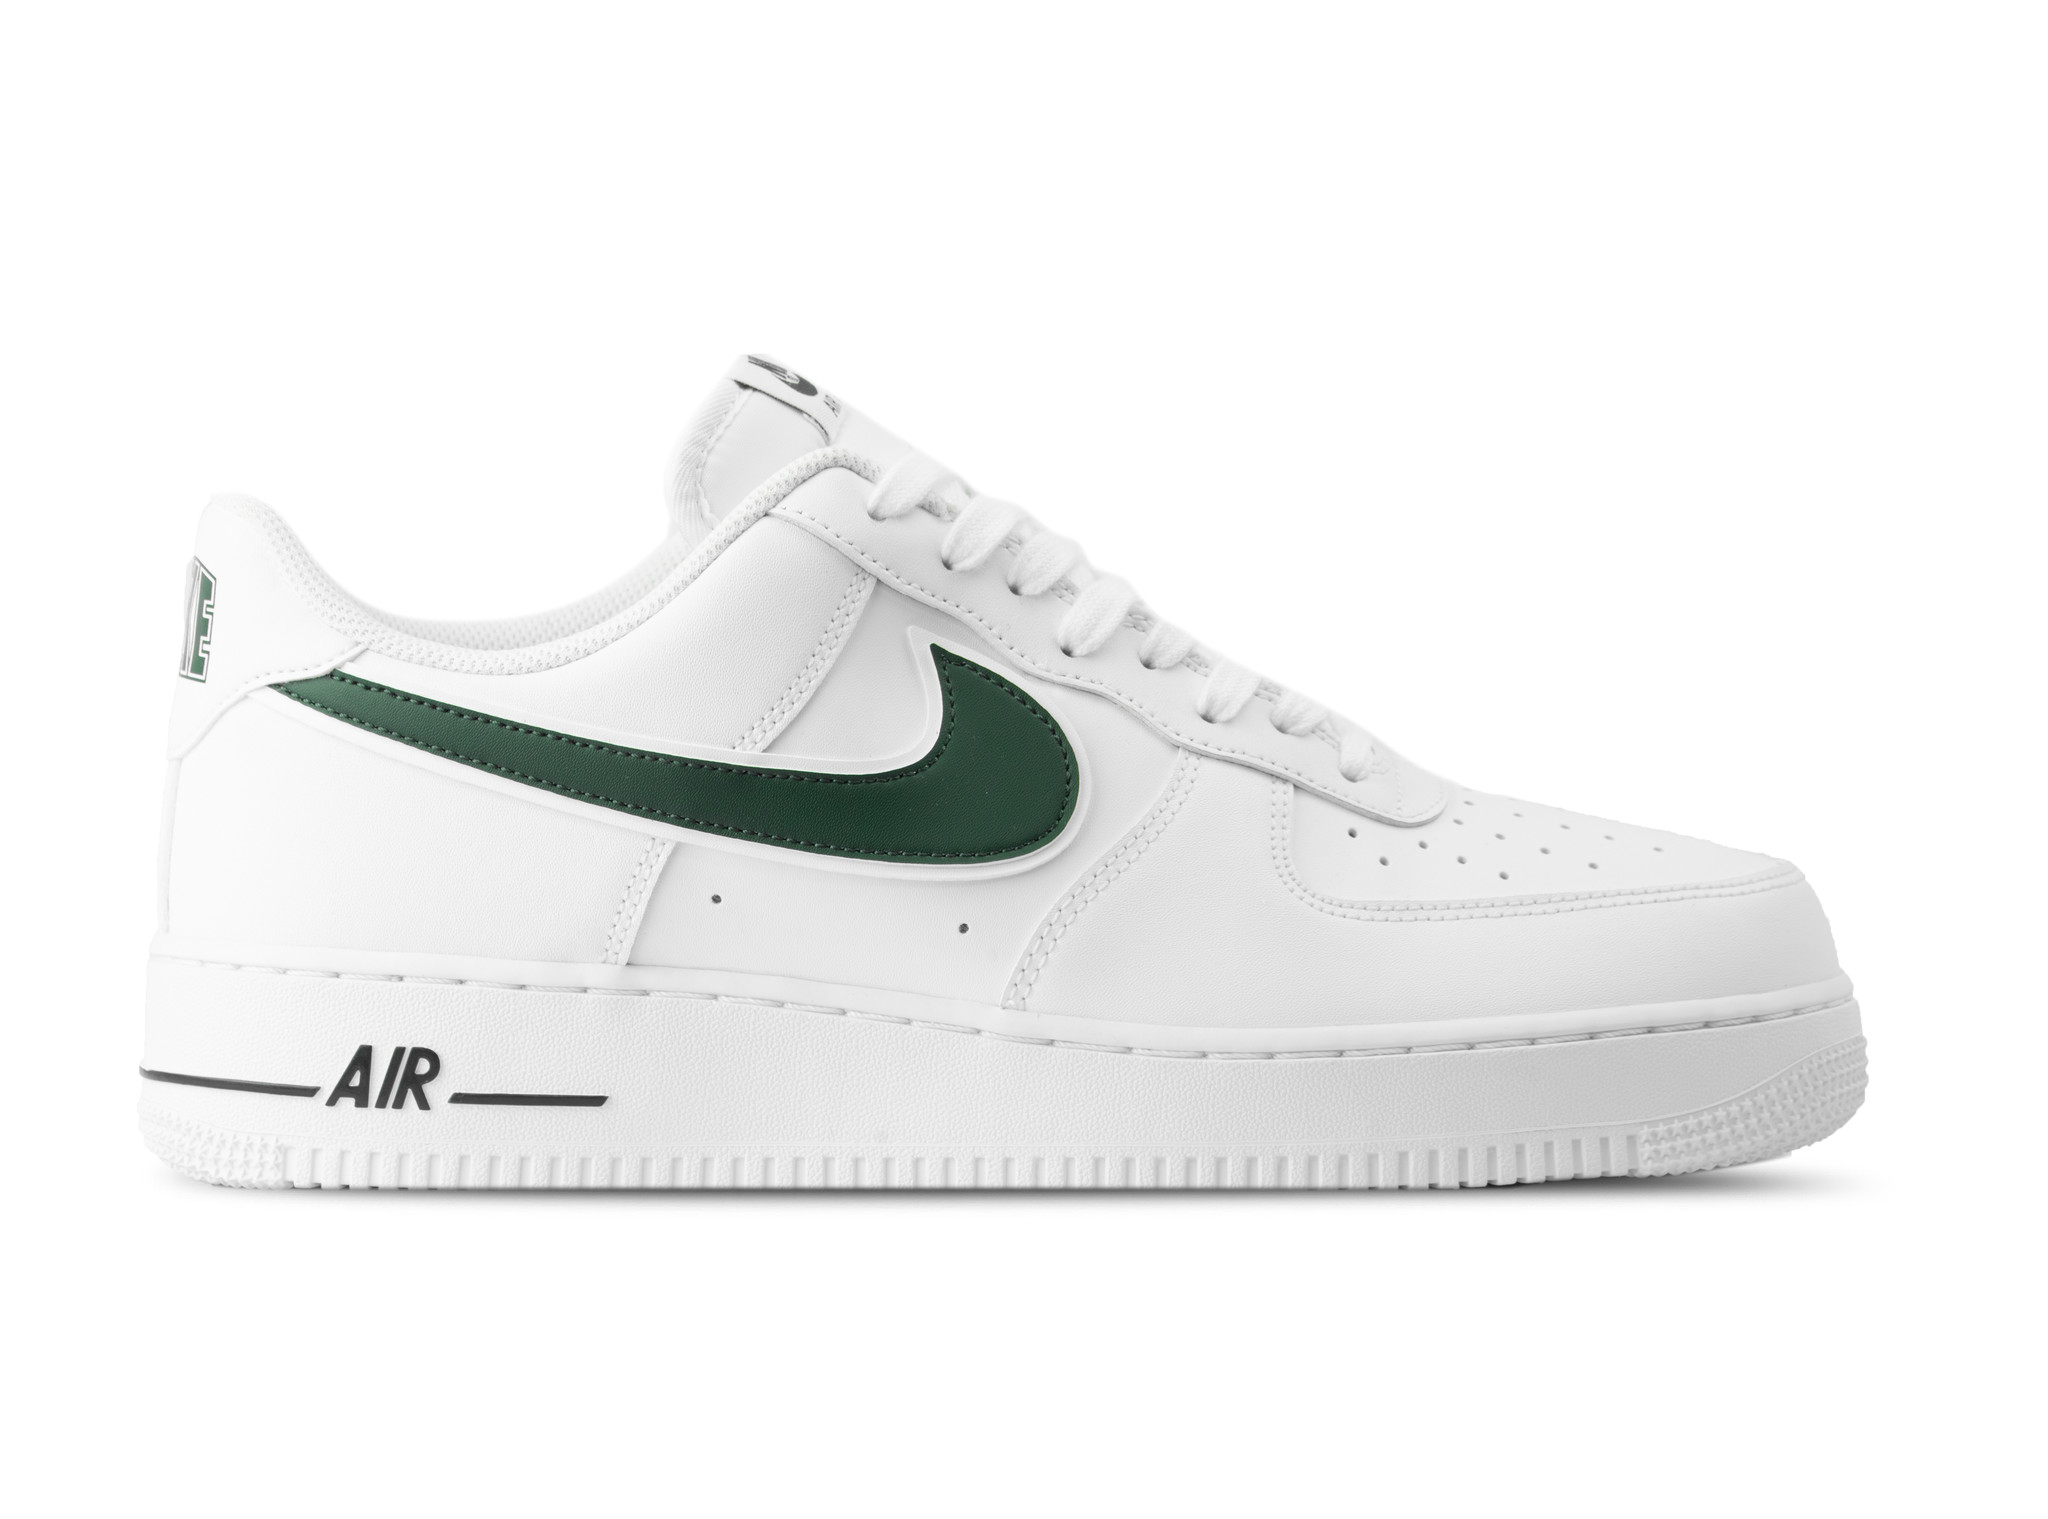 Nike Air Force 1 '07 3 White Cosmic Bonsai AO2423 104